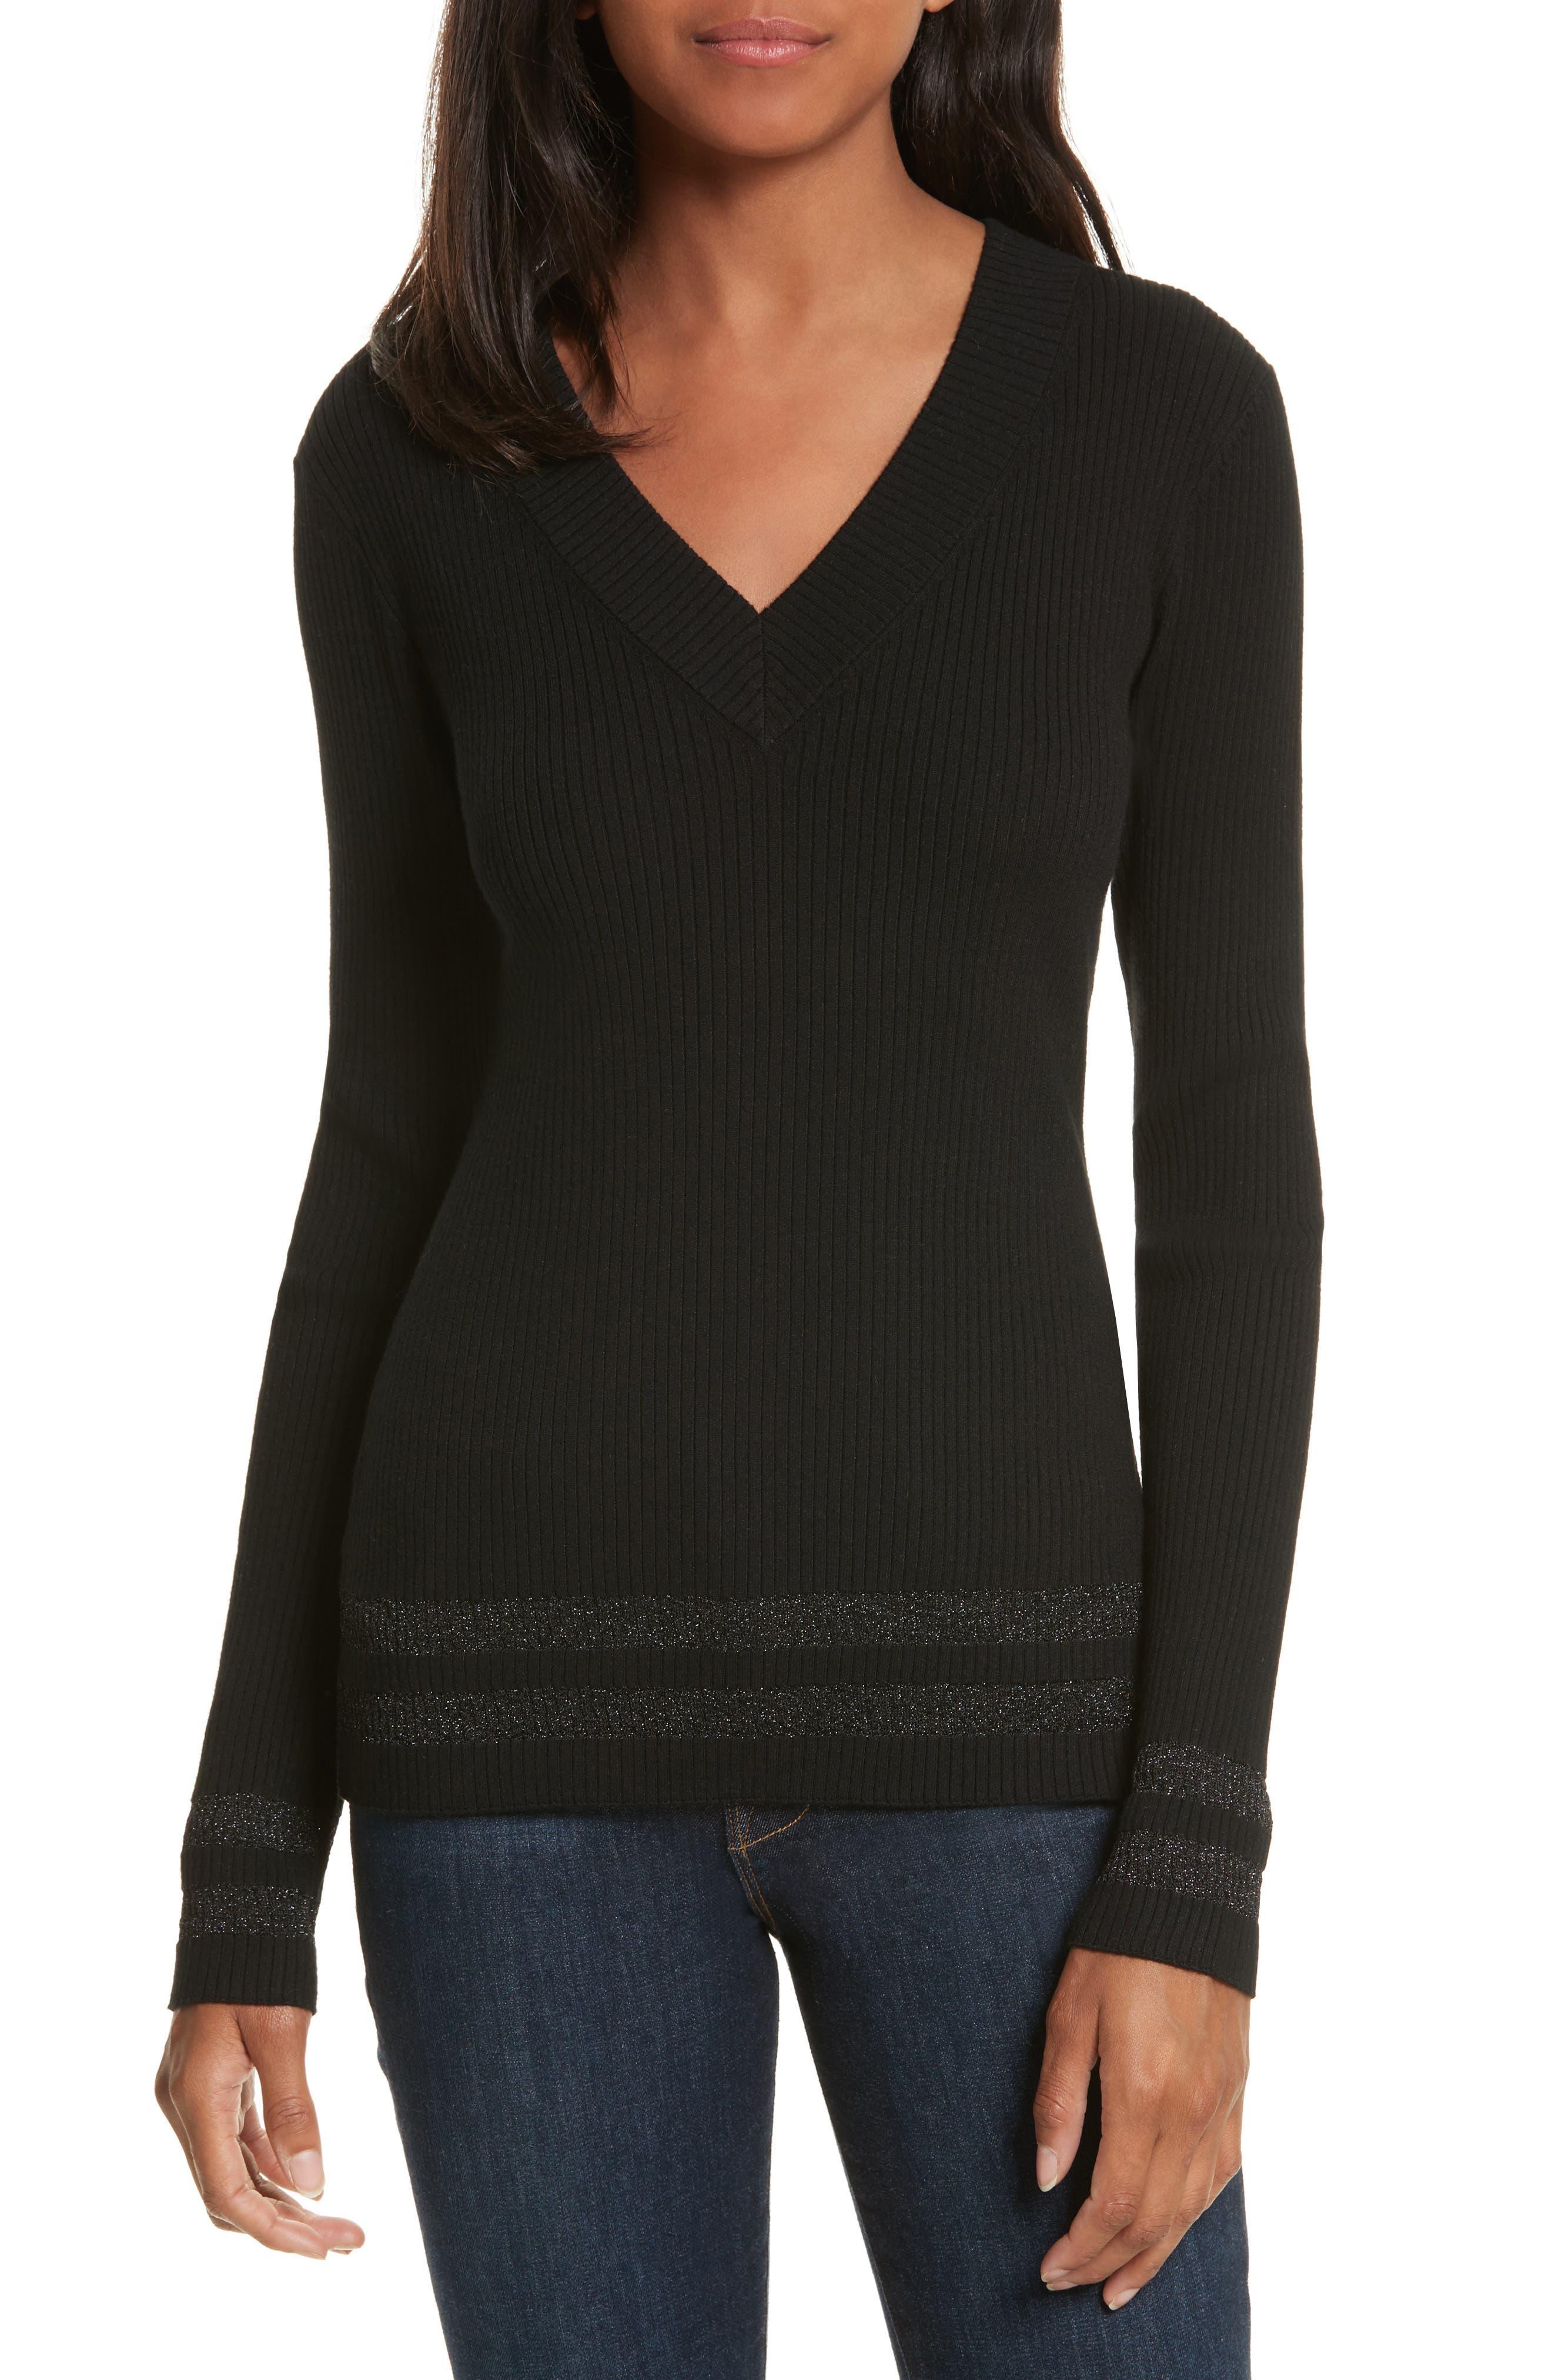 Alternate Image 1 Selected - FRAME Metallic Knit Sweater